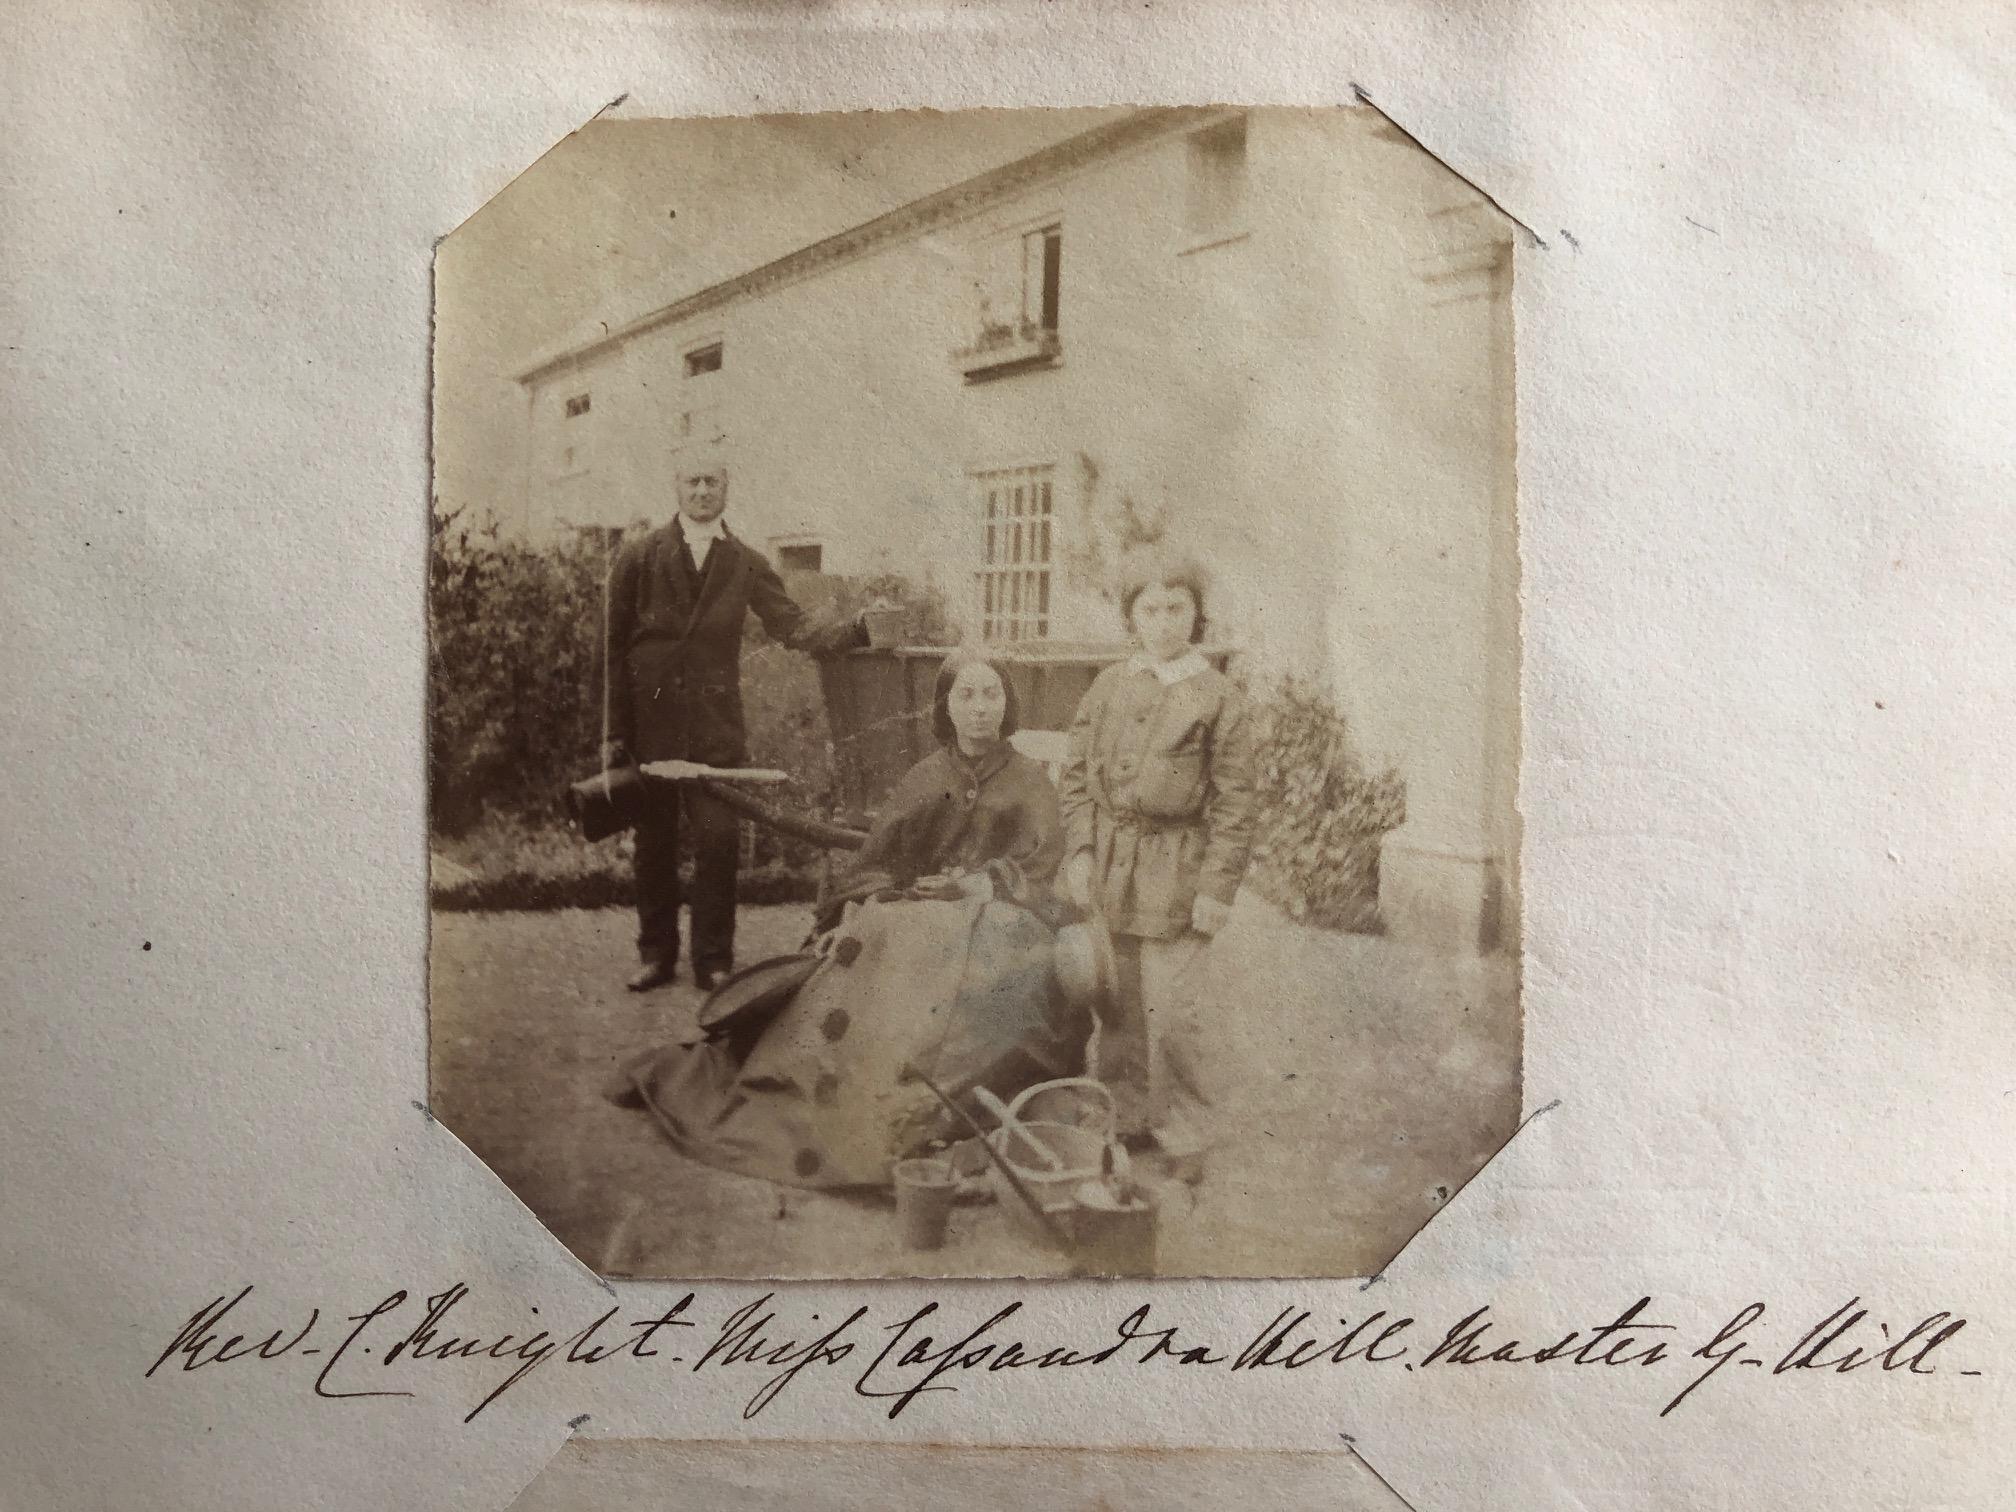 Miss Cassandra Hill, Rev. Charles Knight & Master George Hill.  Credit: Karen Ievers.